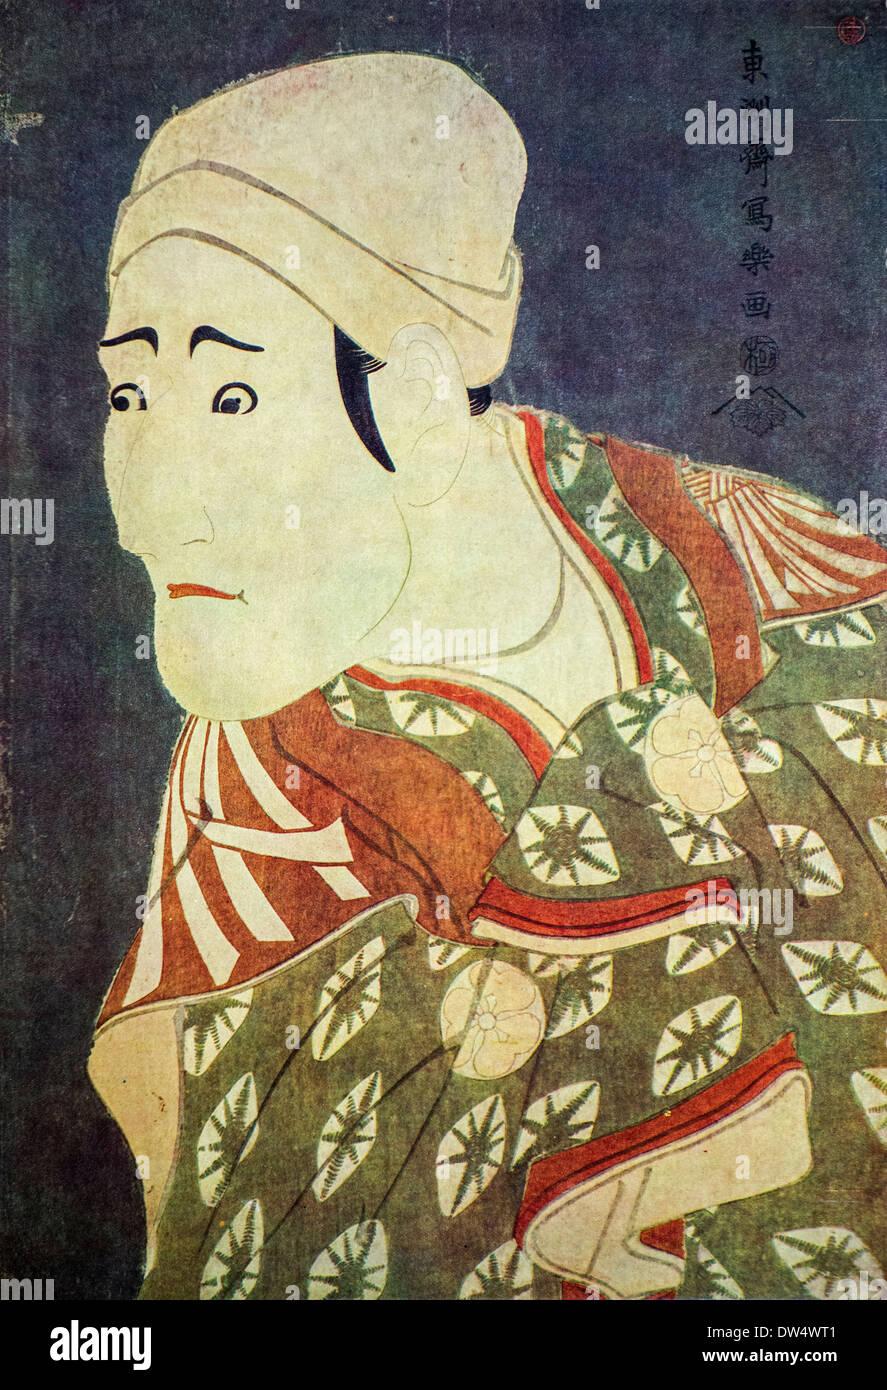 Ukiyo-e woodblock print of the actor Morita Kanya in the role of Ronin by Japanese artist Tōshūsai Sharaku, Japan - Stock Image